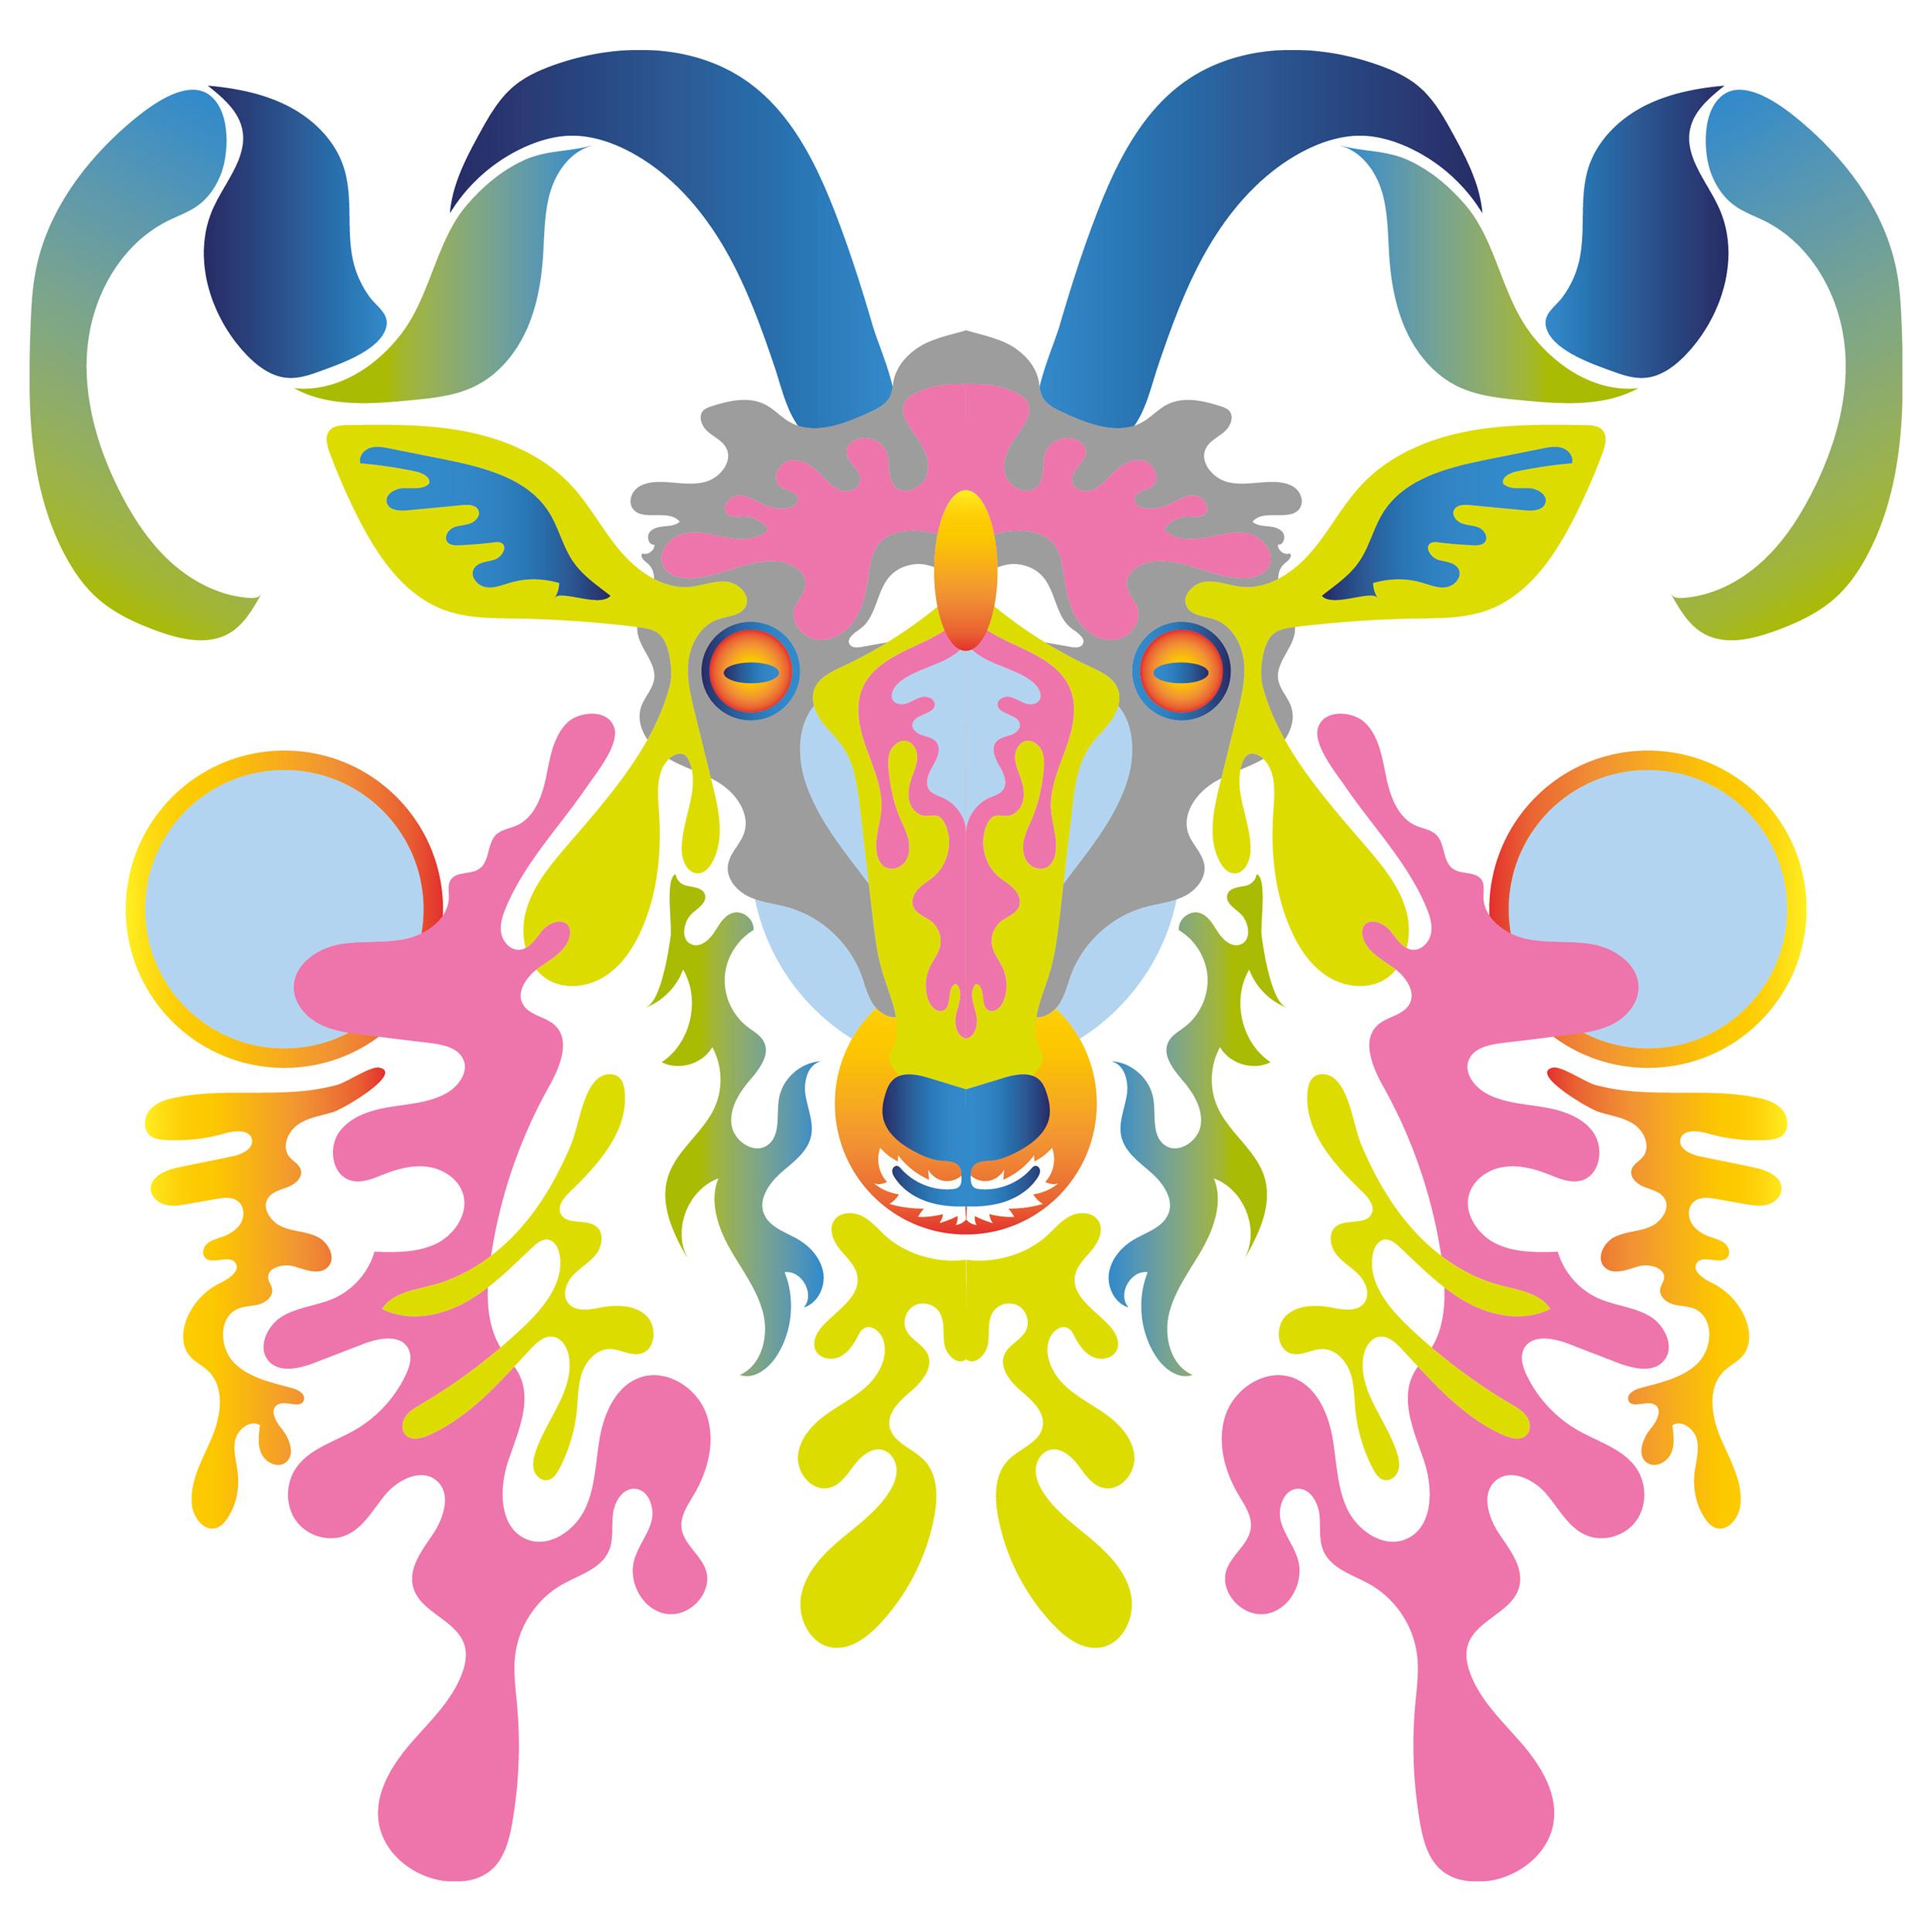 Kleon Medugorac Geometric Animals